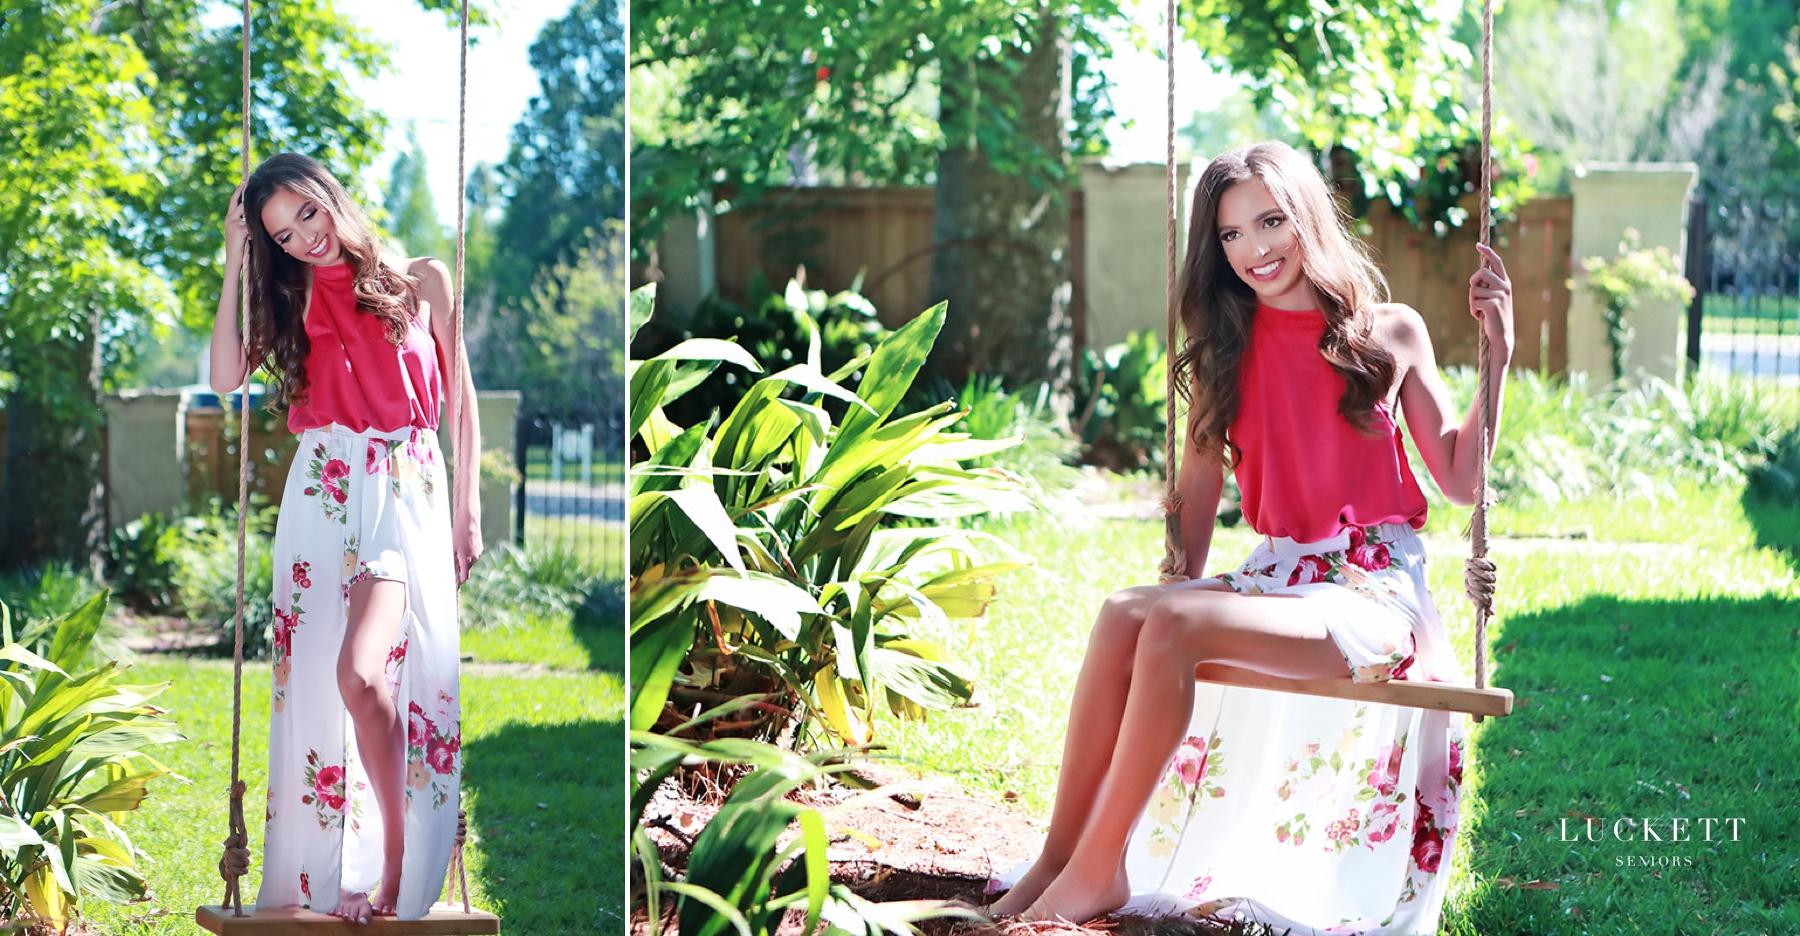 Senior Picture Ideas Girls 5